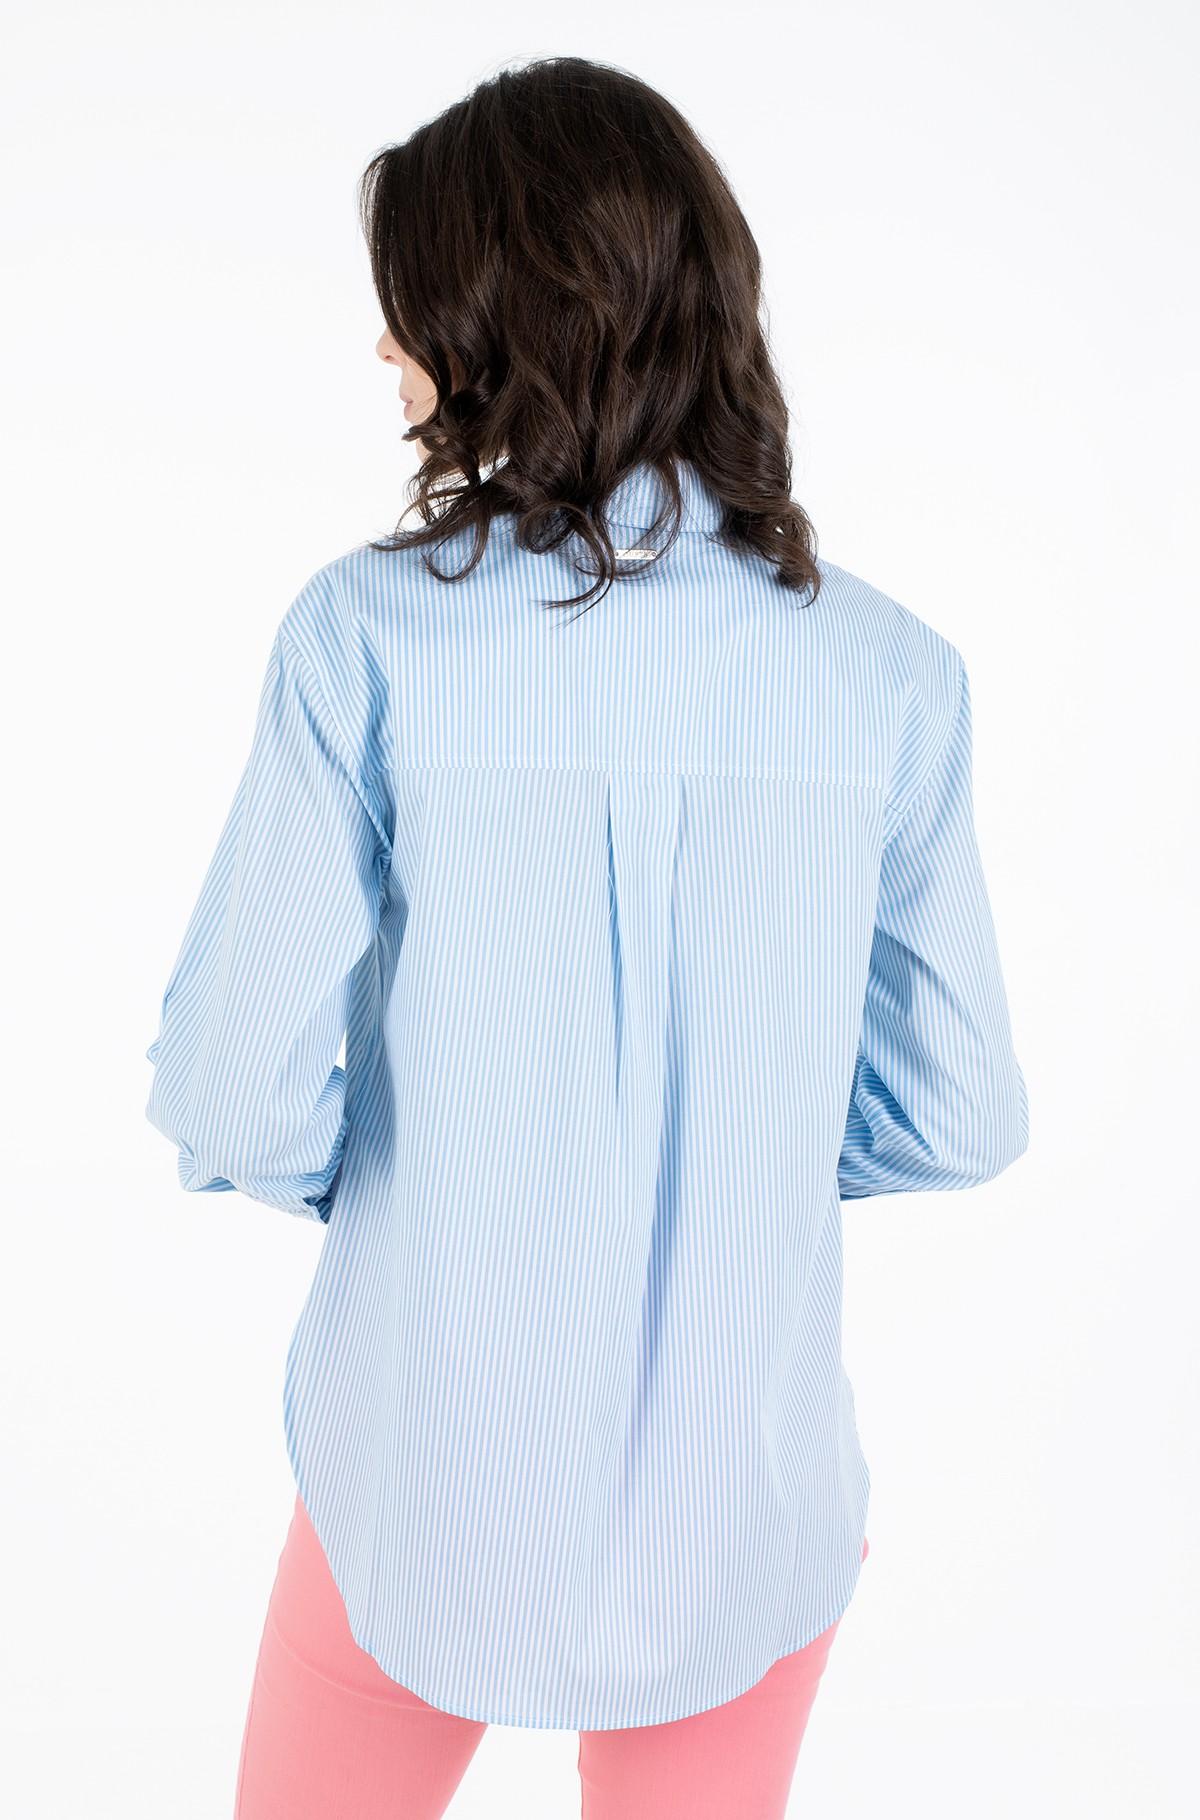 Marškiniai W01H58 WCLQ0-full-3